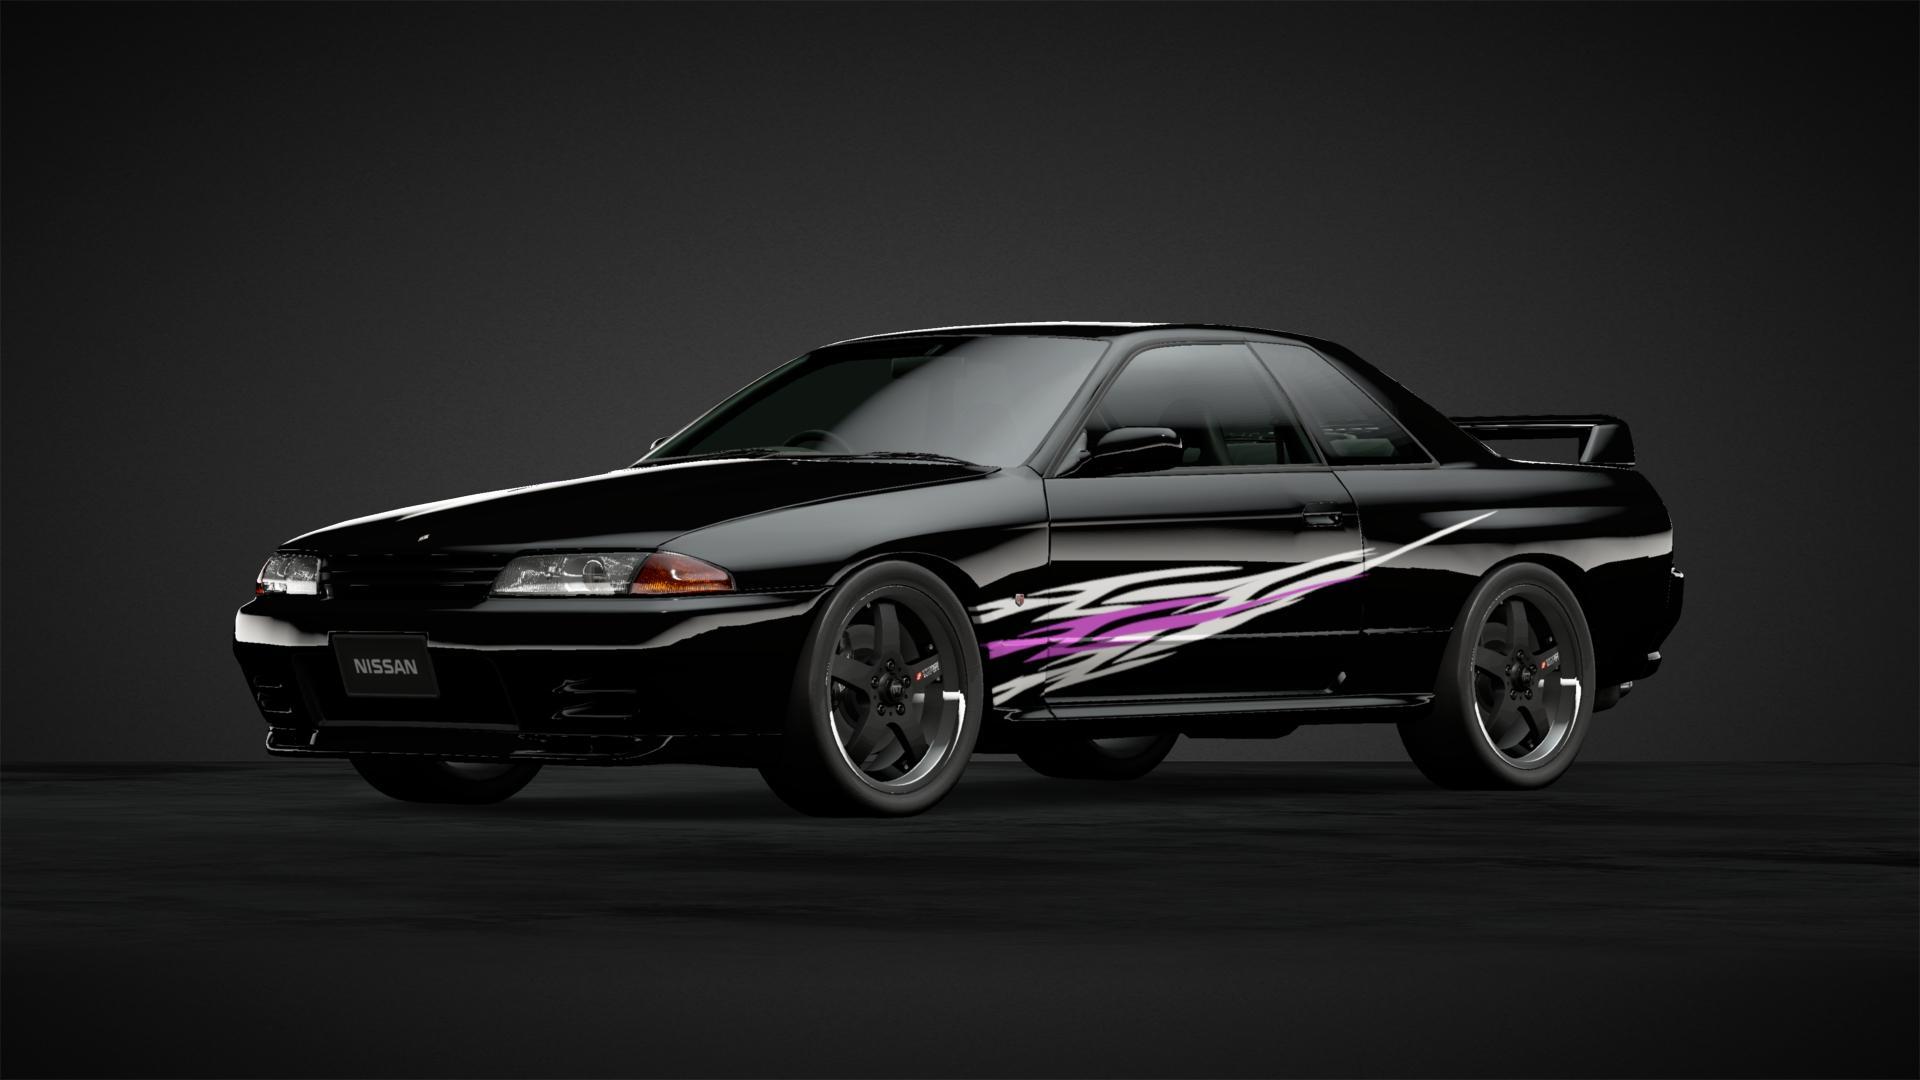 Team Pinkdoll Nobu Car Livery By Yusuke 7906 Community Gran